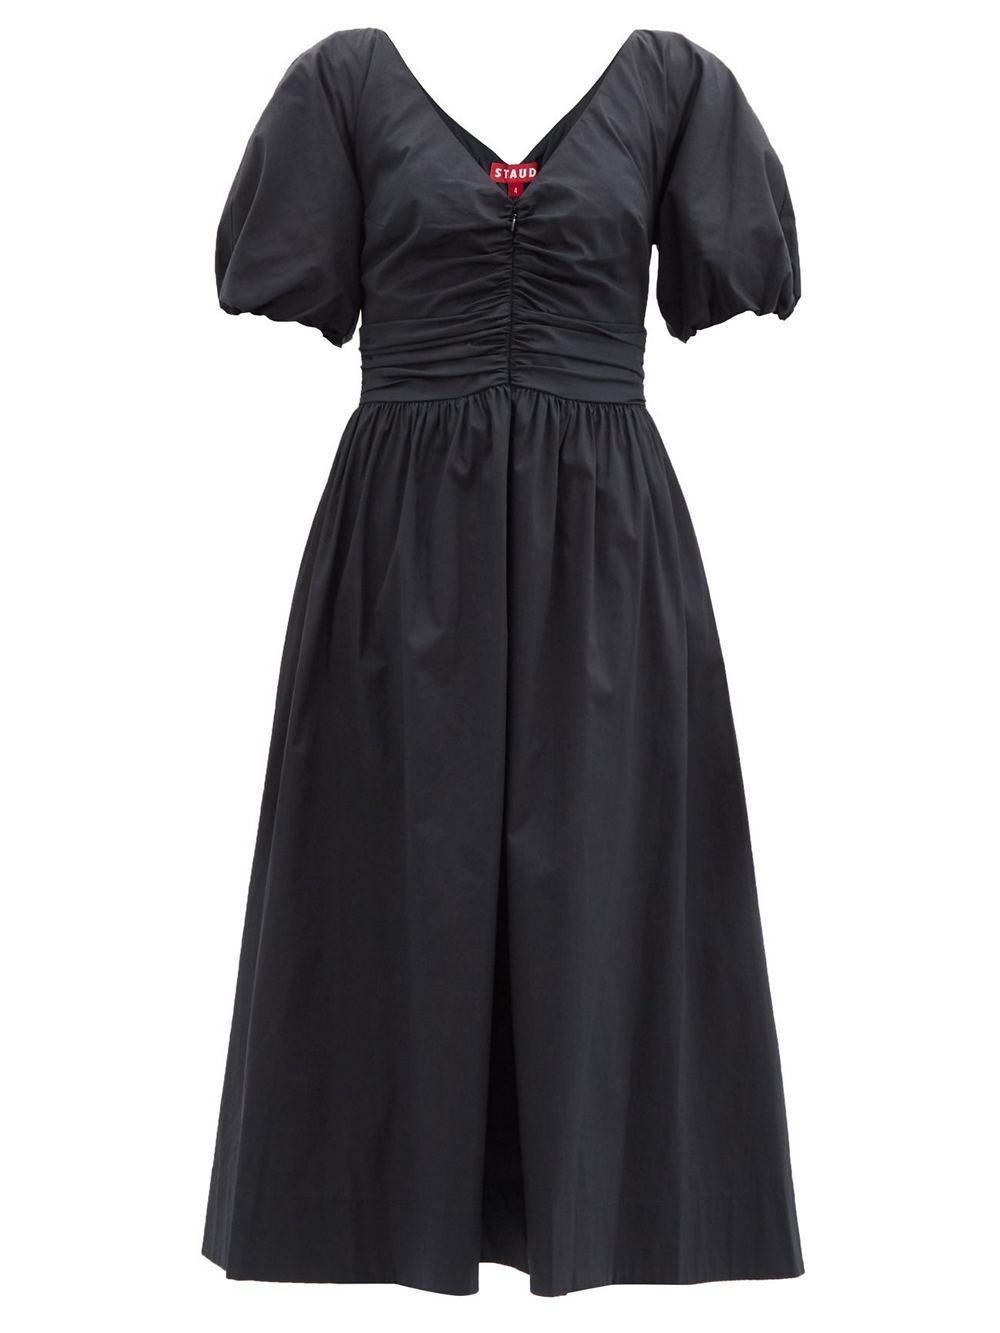 Greta Dress Item # 90-7422